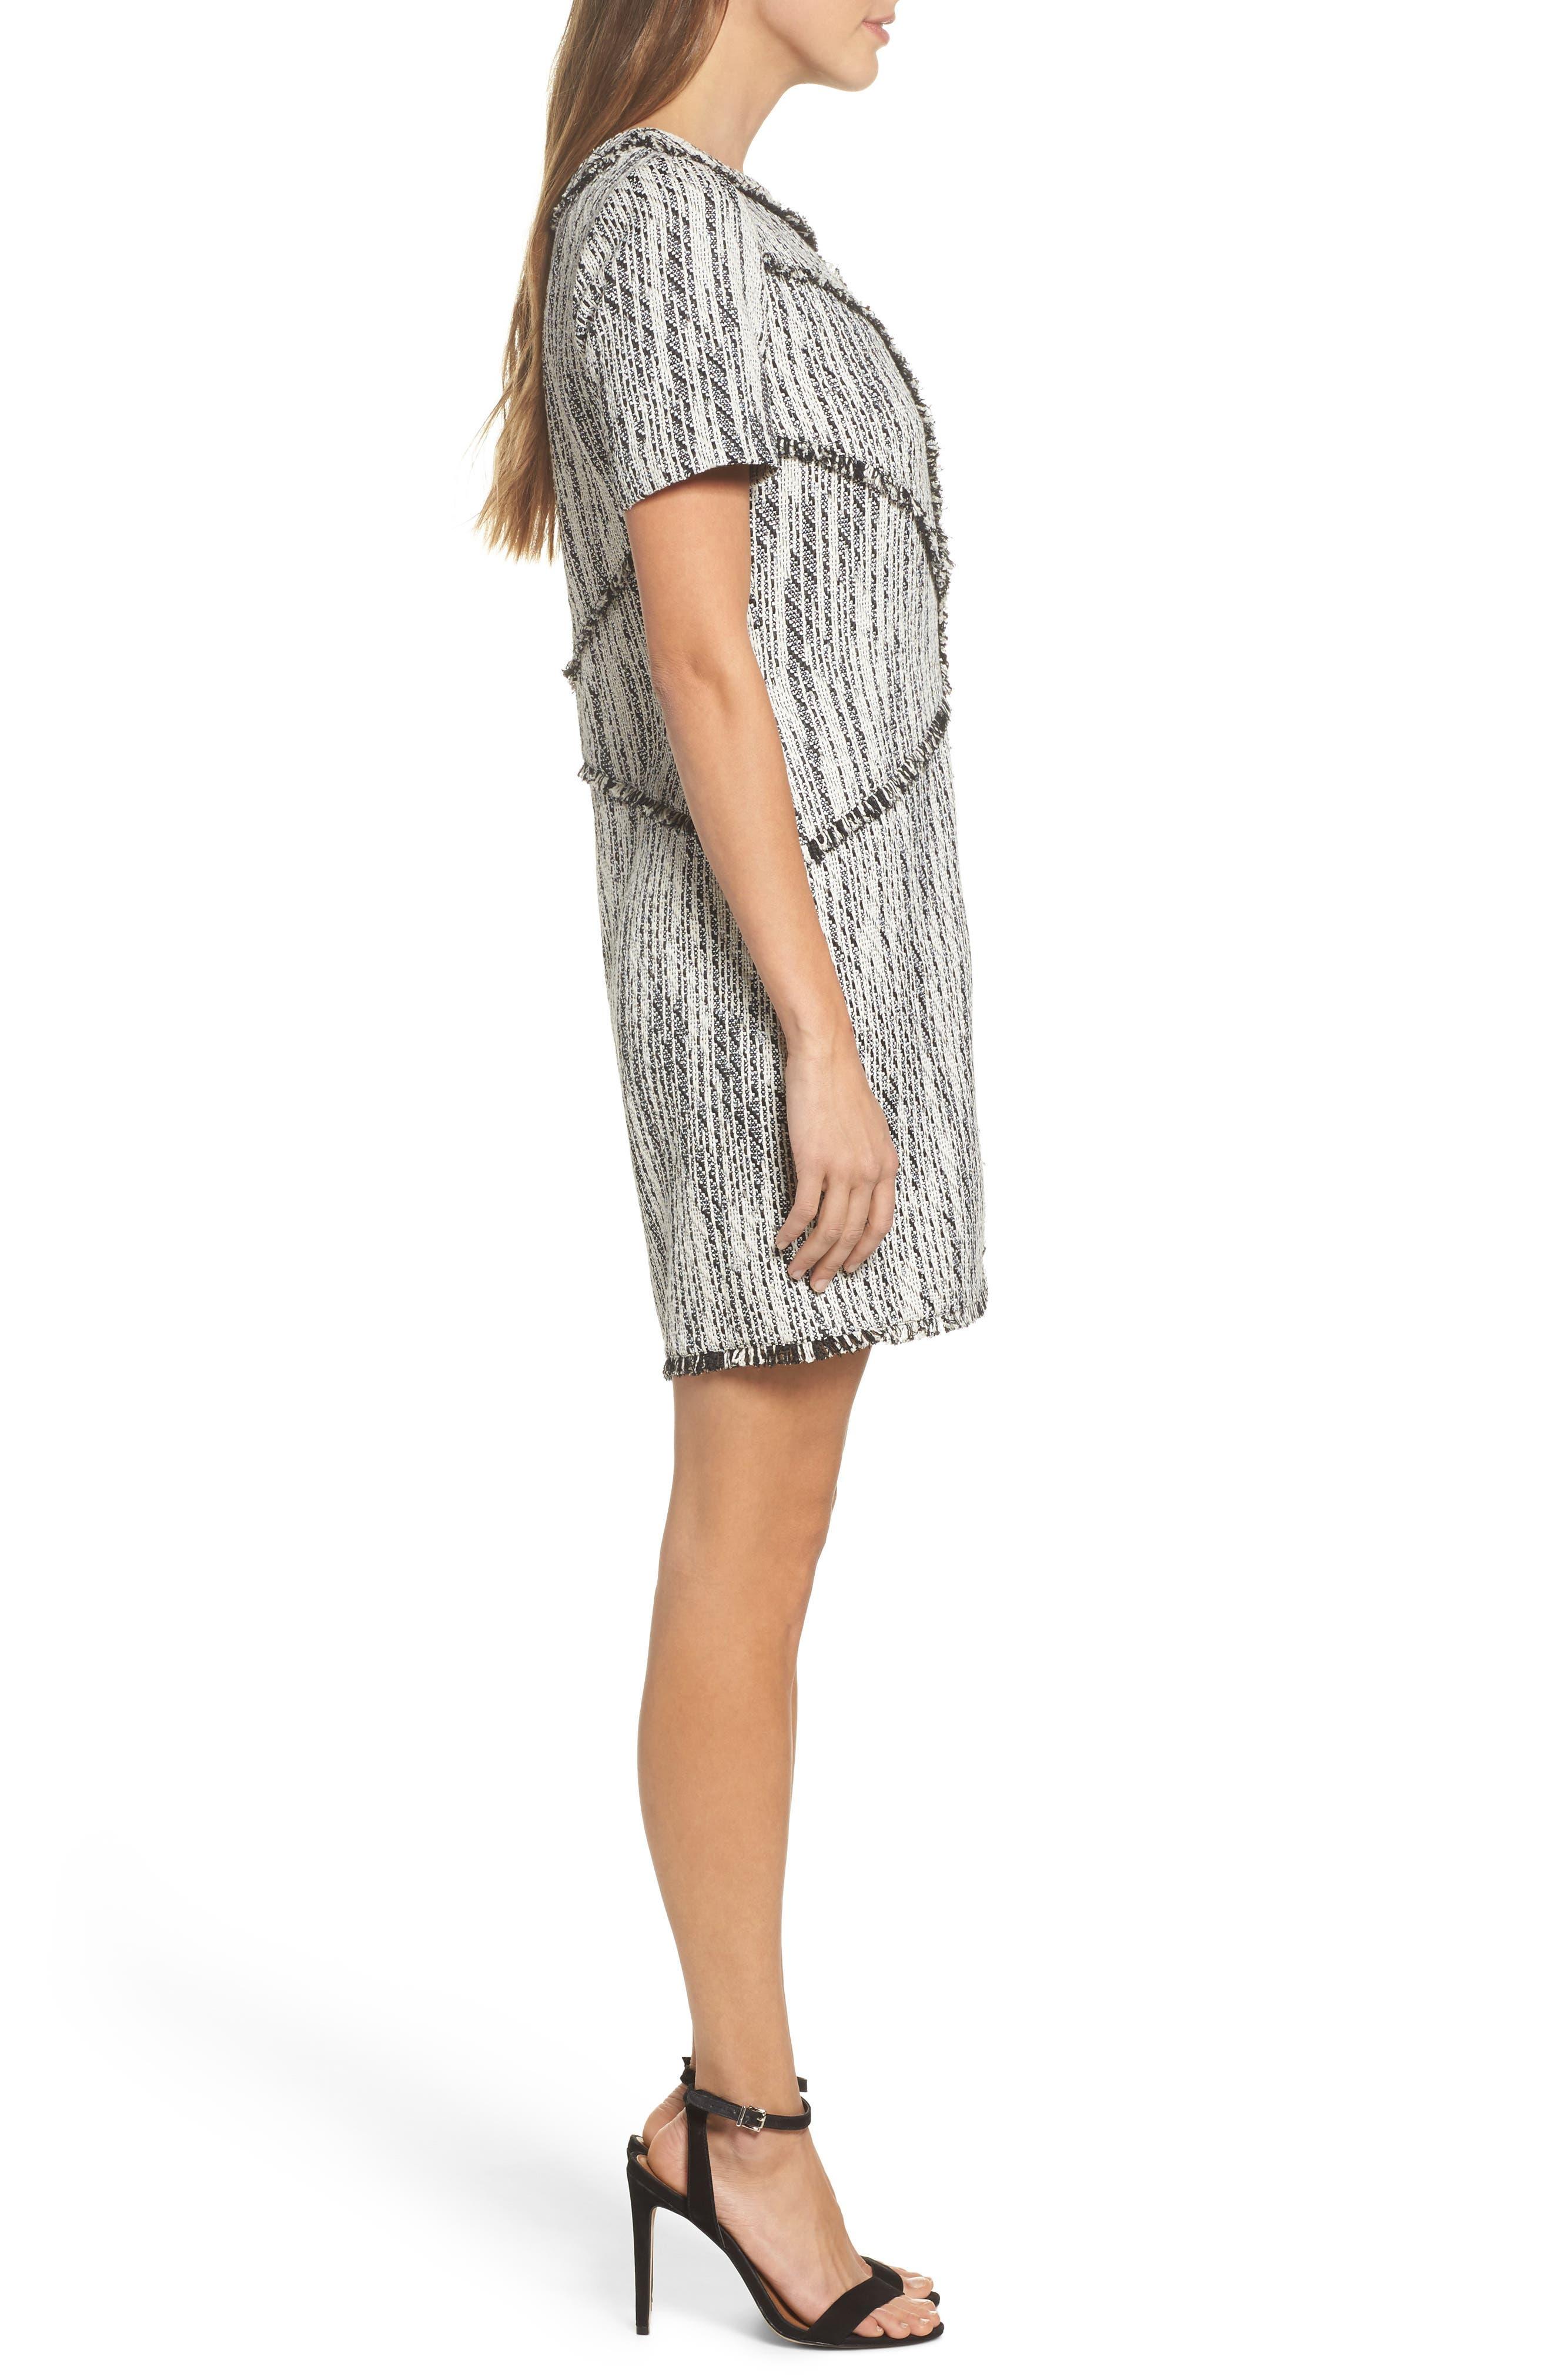 Dolce Vita Tweed Shift Dress,                             Alternate thumbnail 4, color,                             Black/ Ivory Tweed